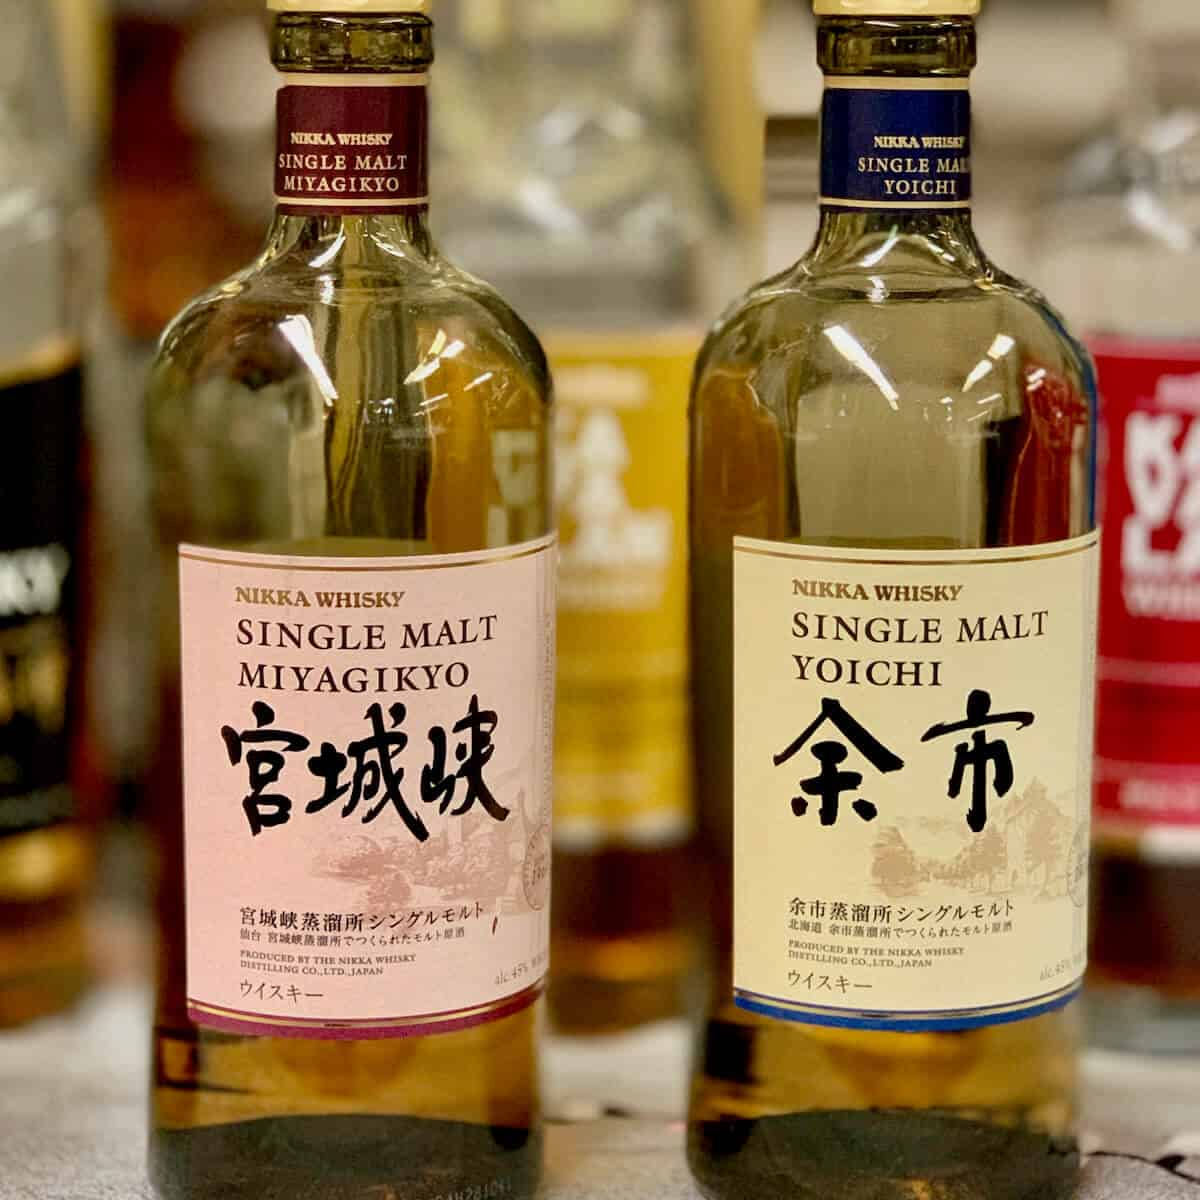 Nikka Single Malt Miyagikyo & YoIchi in bottles whisky on a table.